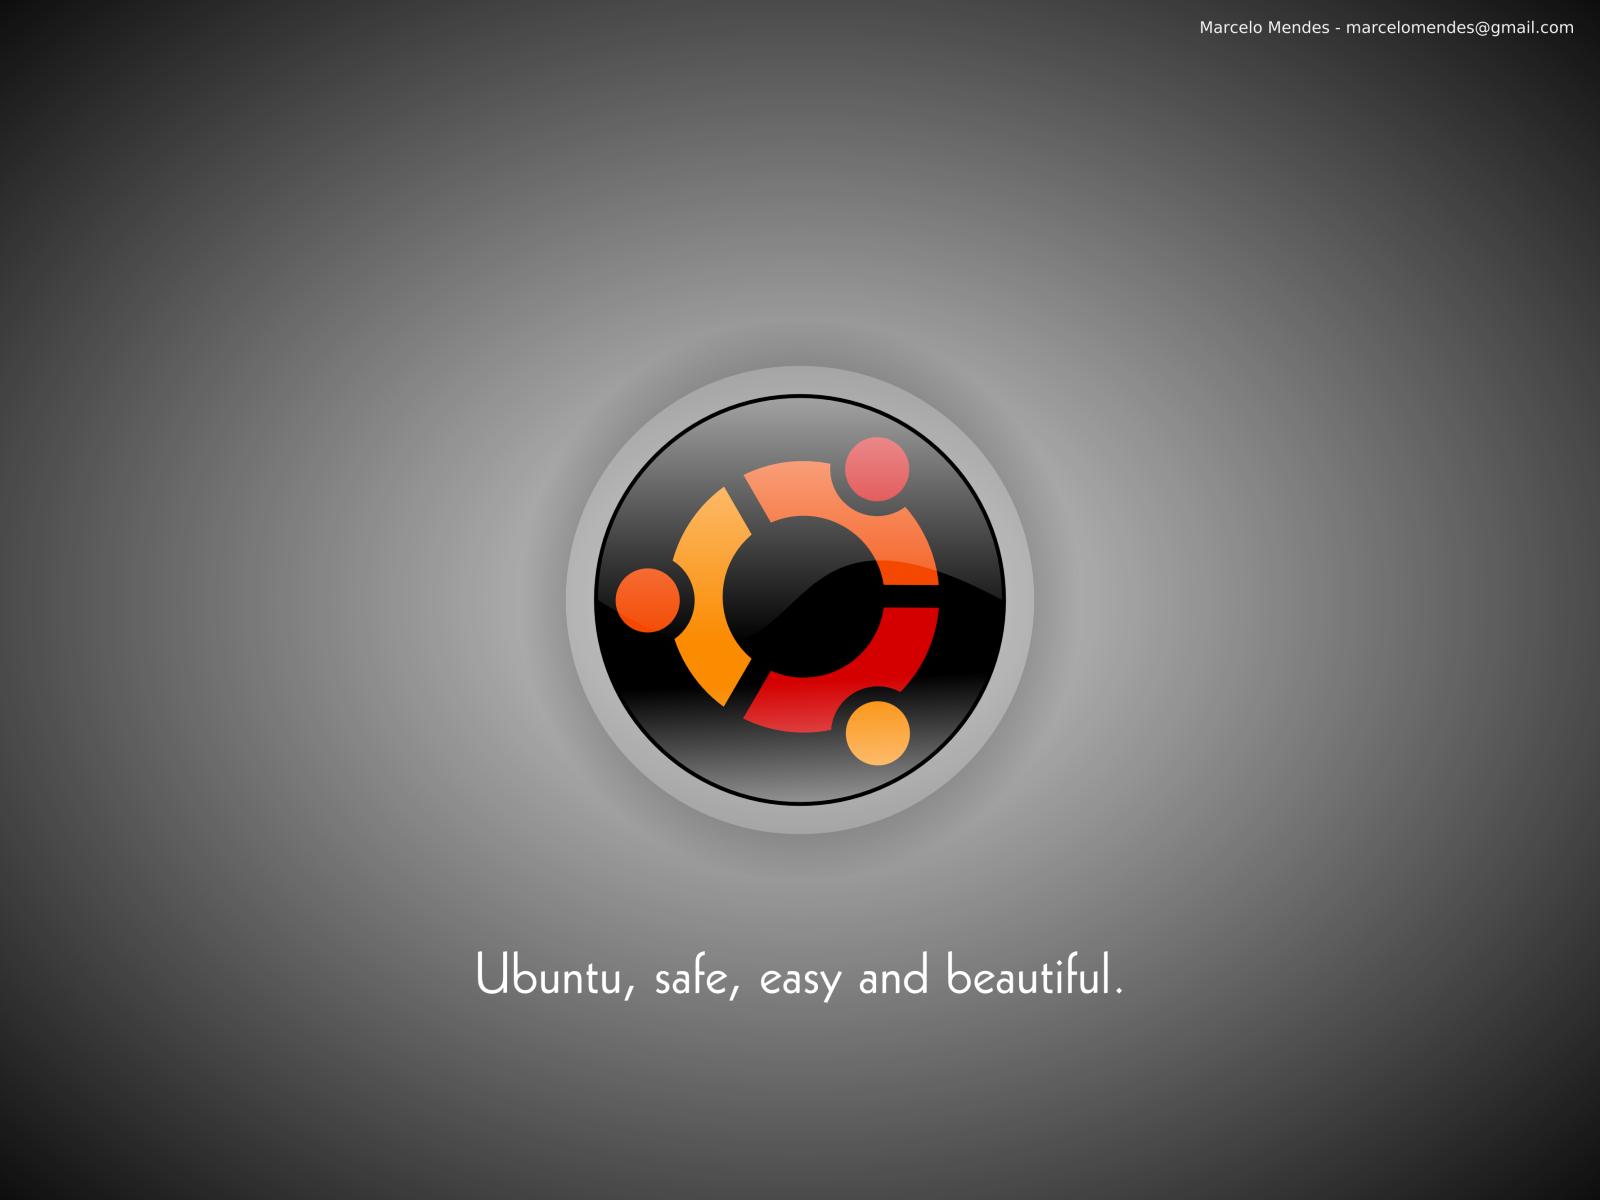 ubuntu wallpapers hd ubuntu wallpapers hd ubuntu wallpapers hd ubuntu 1600x1200